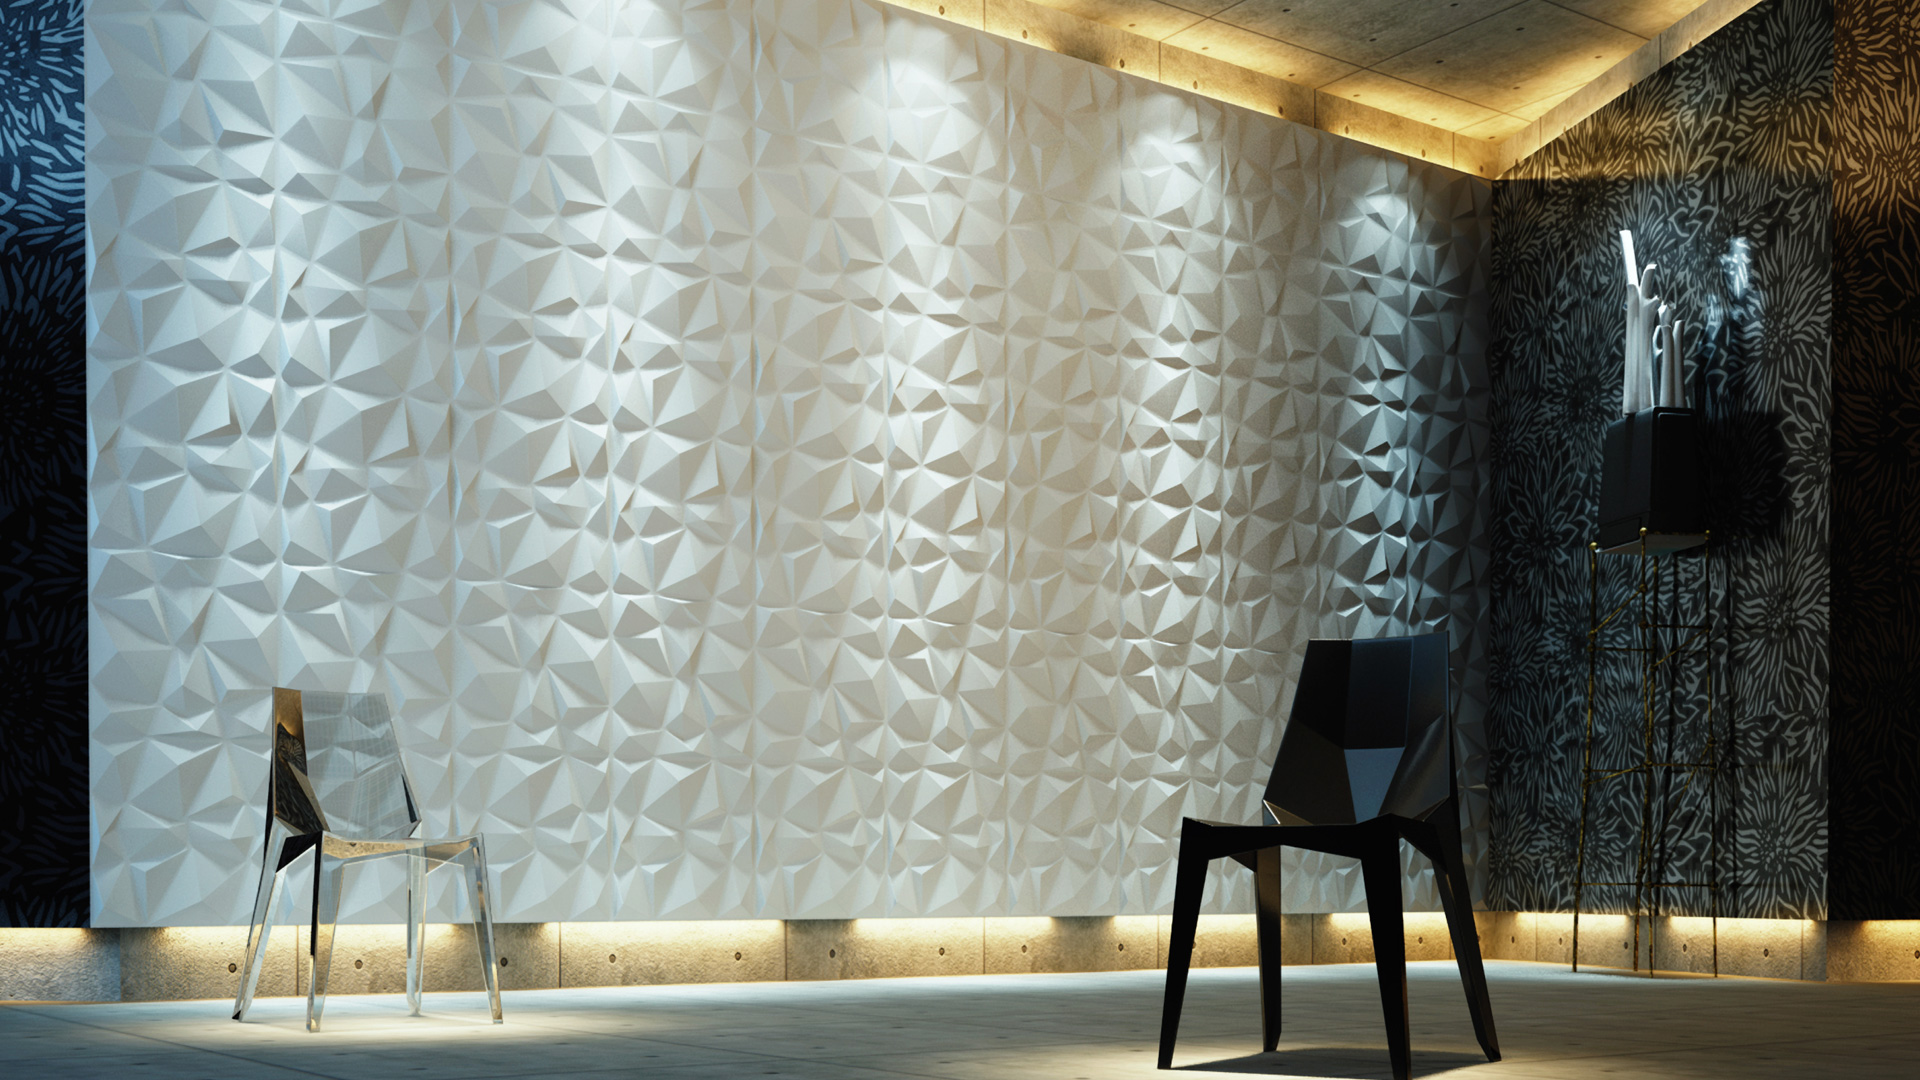 3D Wandpaneele - Produkte - Diamond - Deckenpaneele - 3D Tapeten - Wandverkleidung